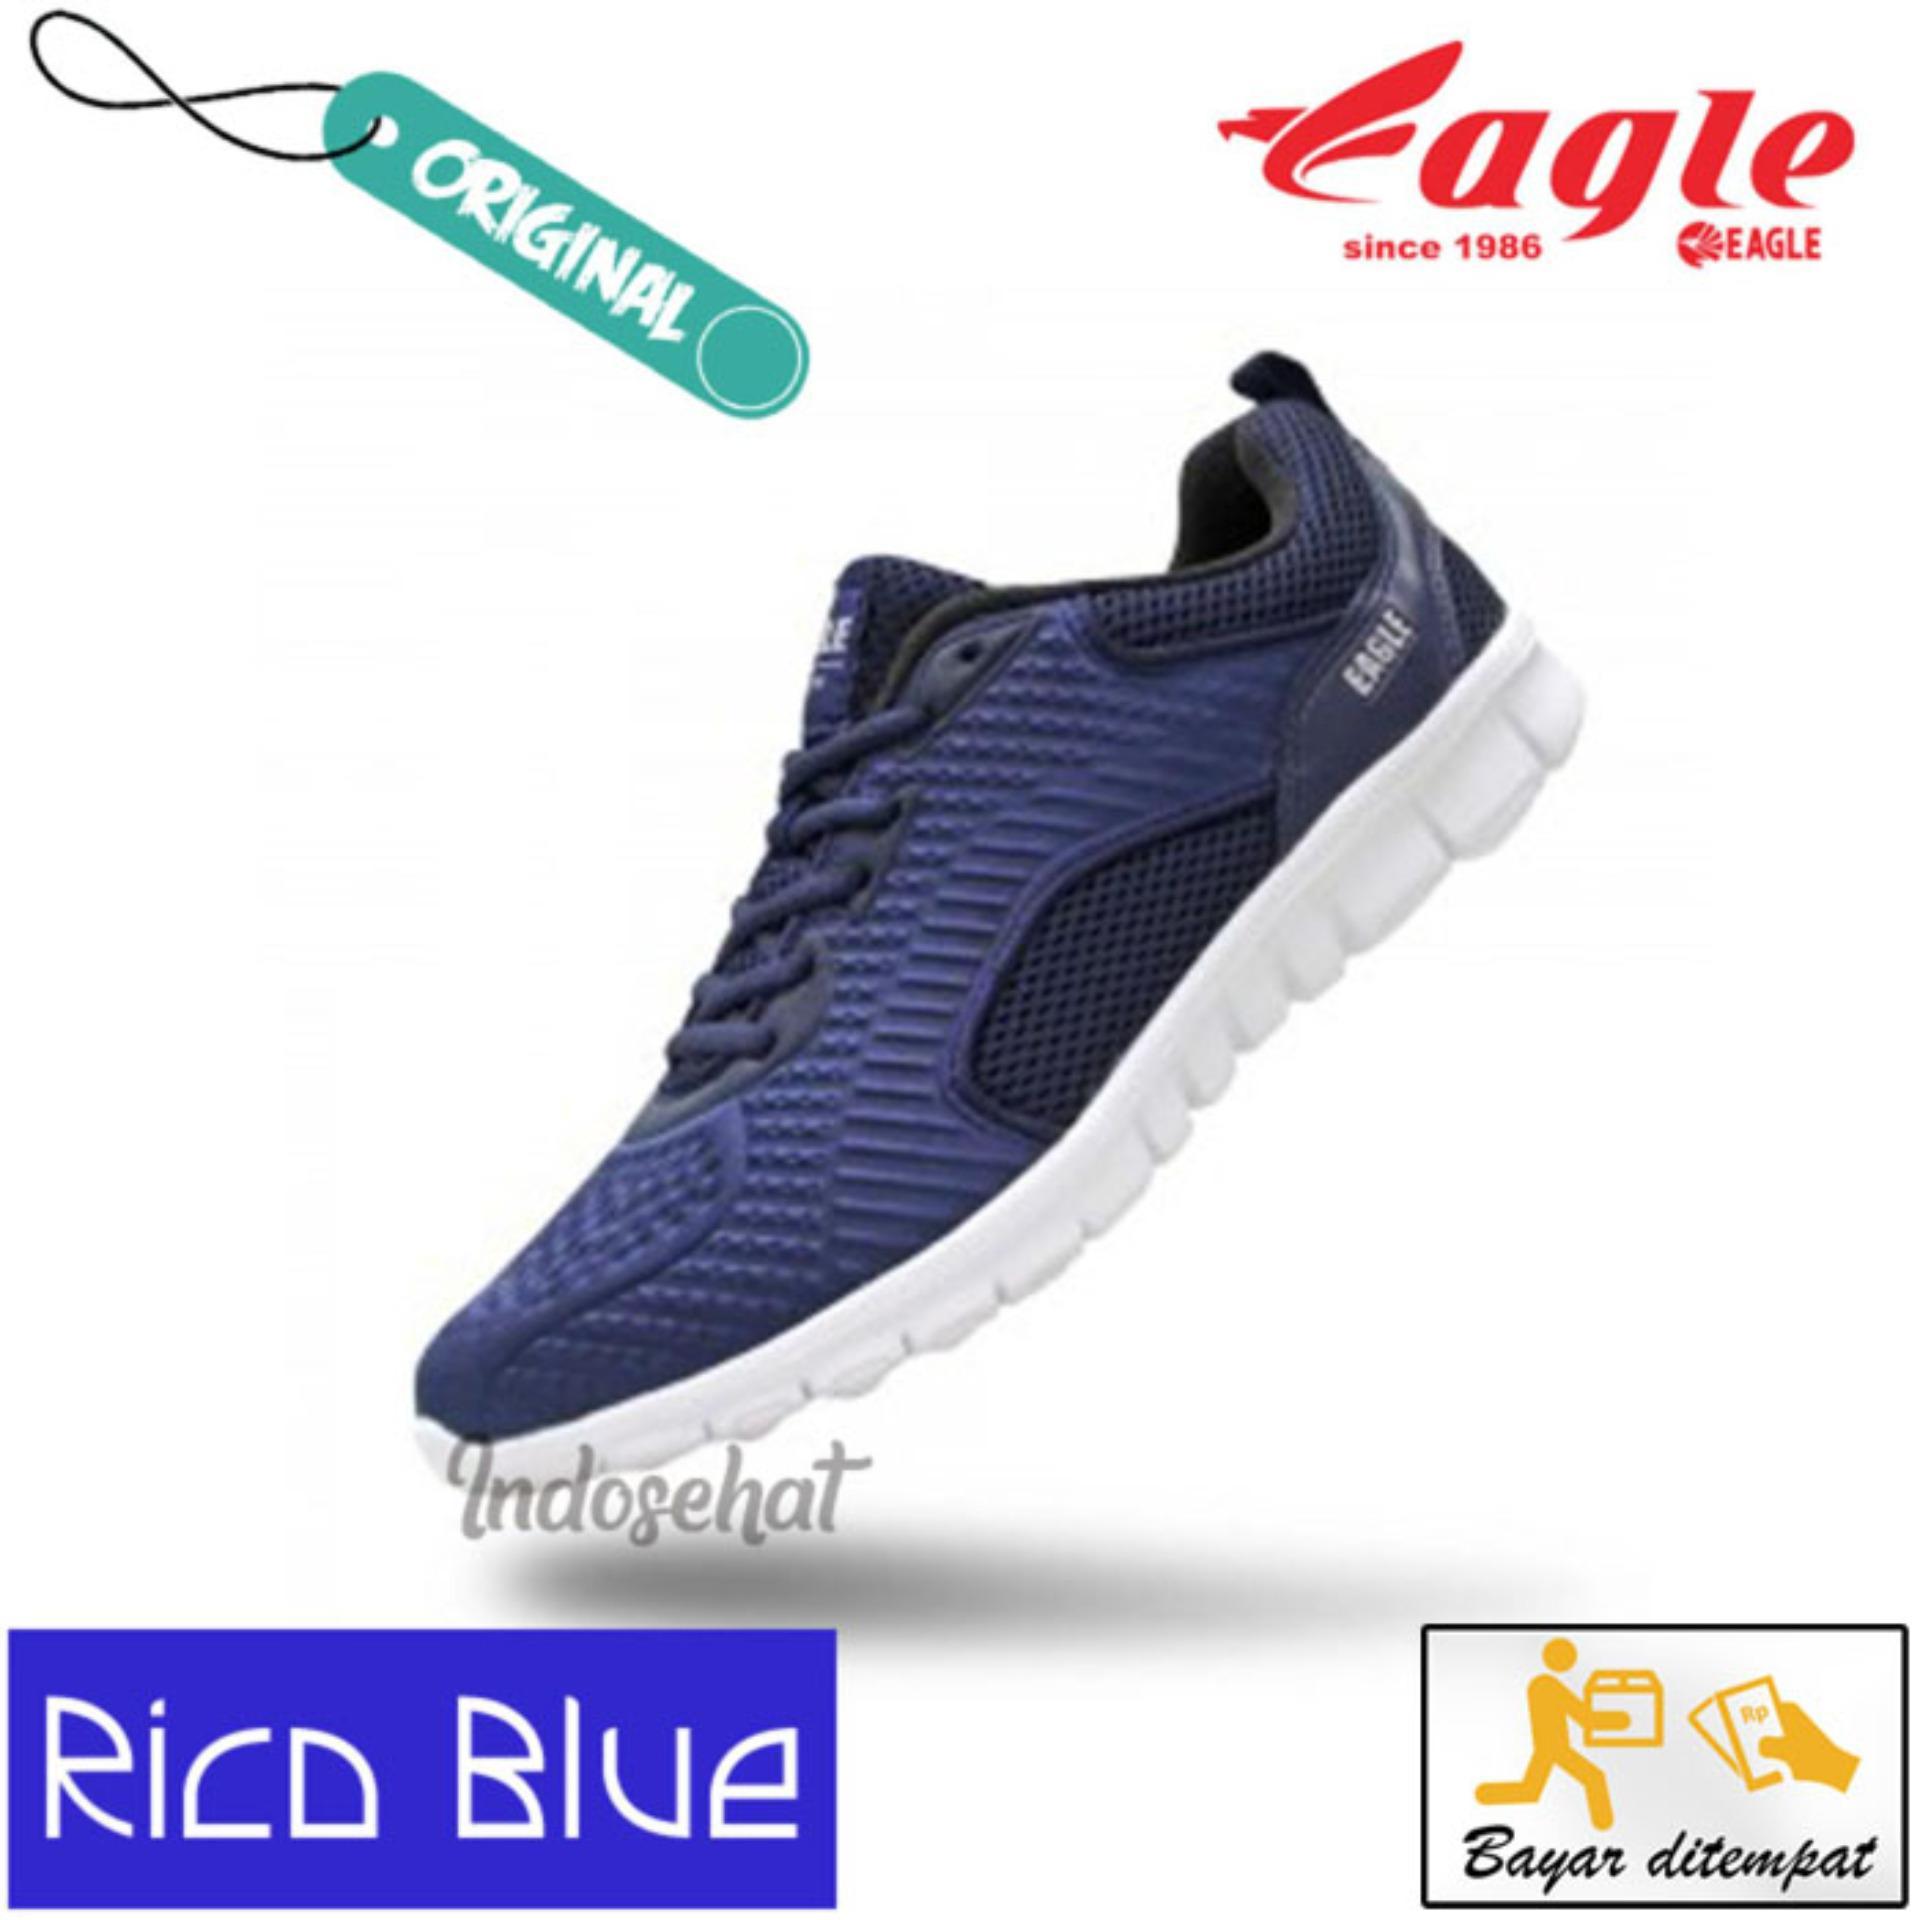 Jual Sepatu Eagle Terbaru Neutron Running Grey Navy Org 37 Olahraga Rico Blue White